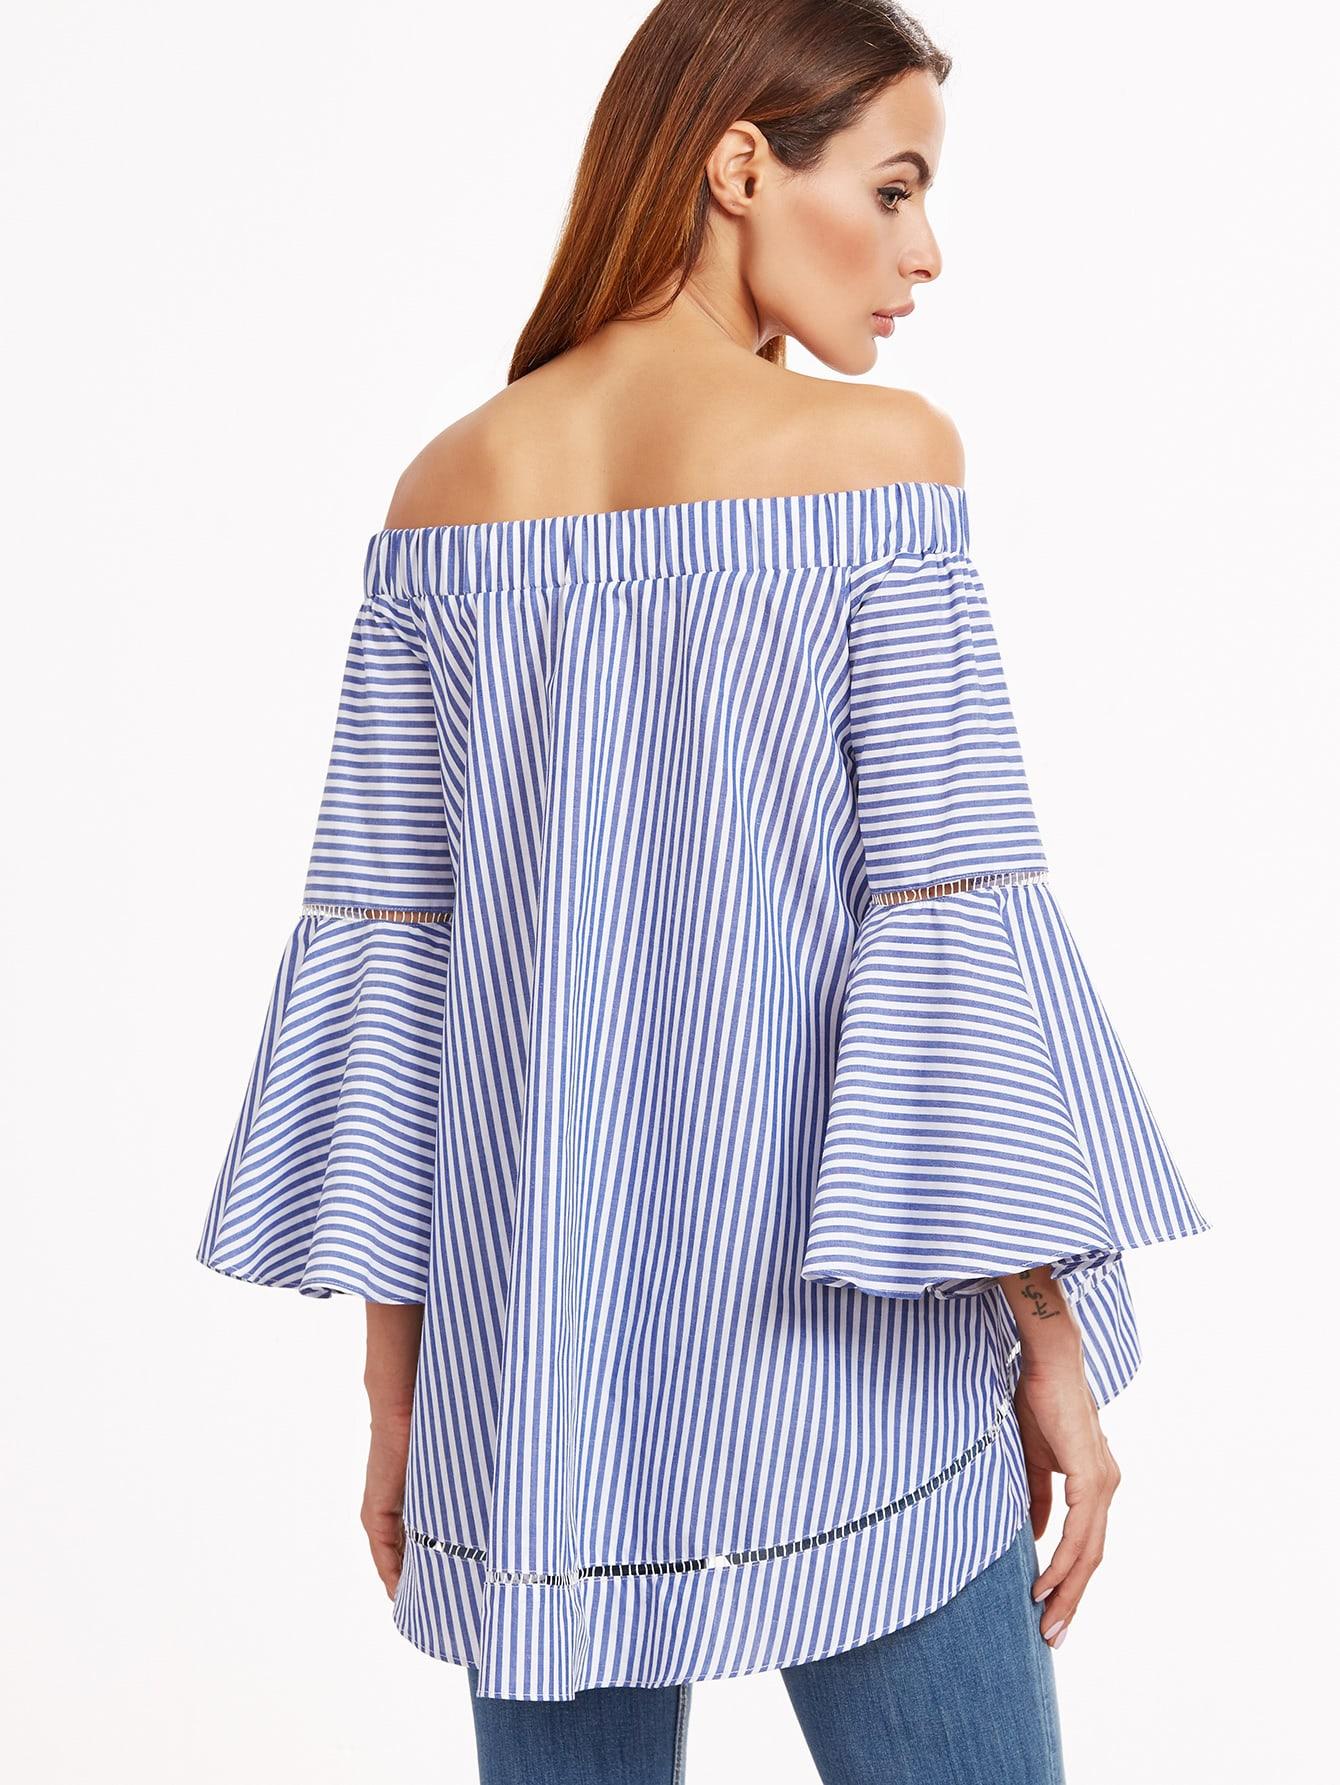 blouse161111703_2